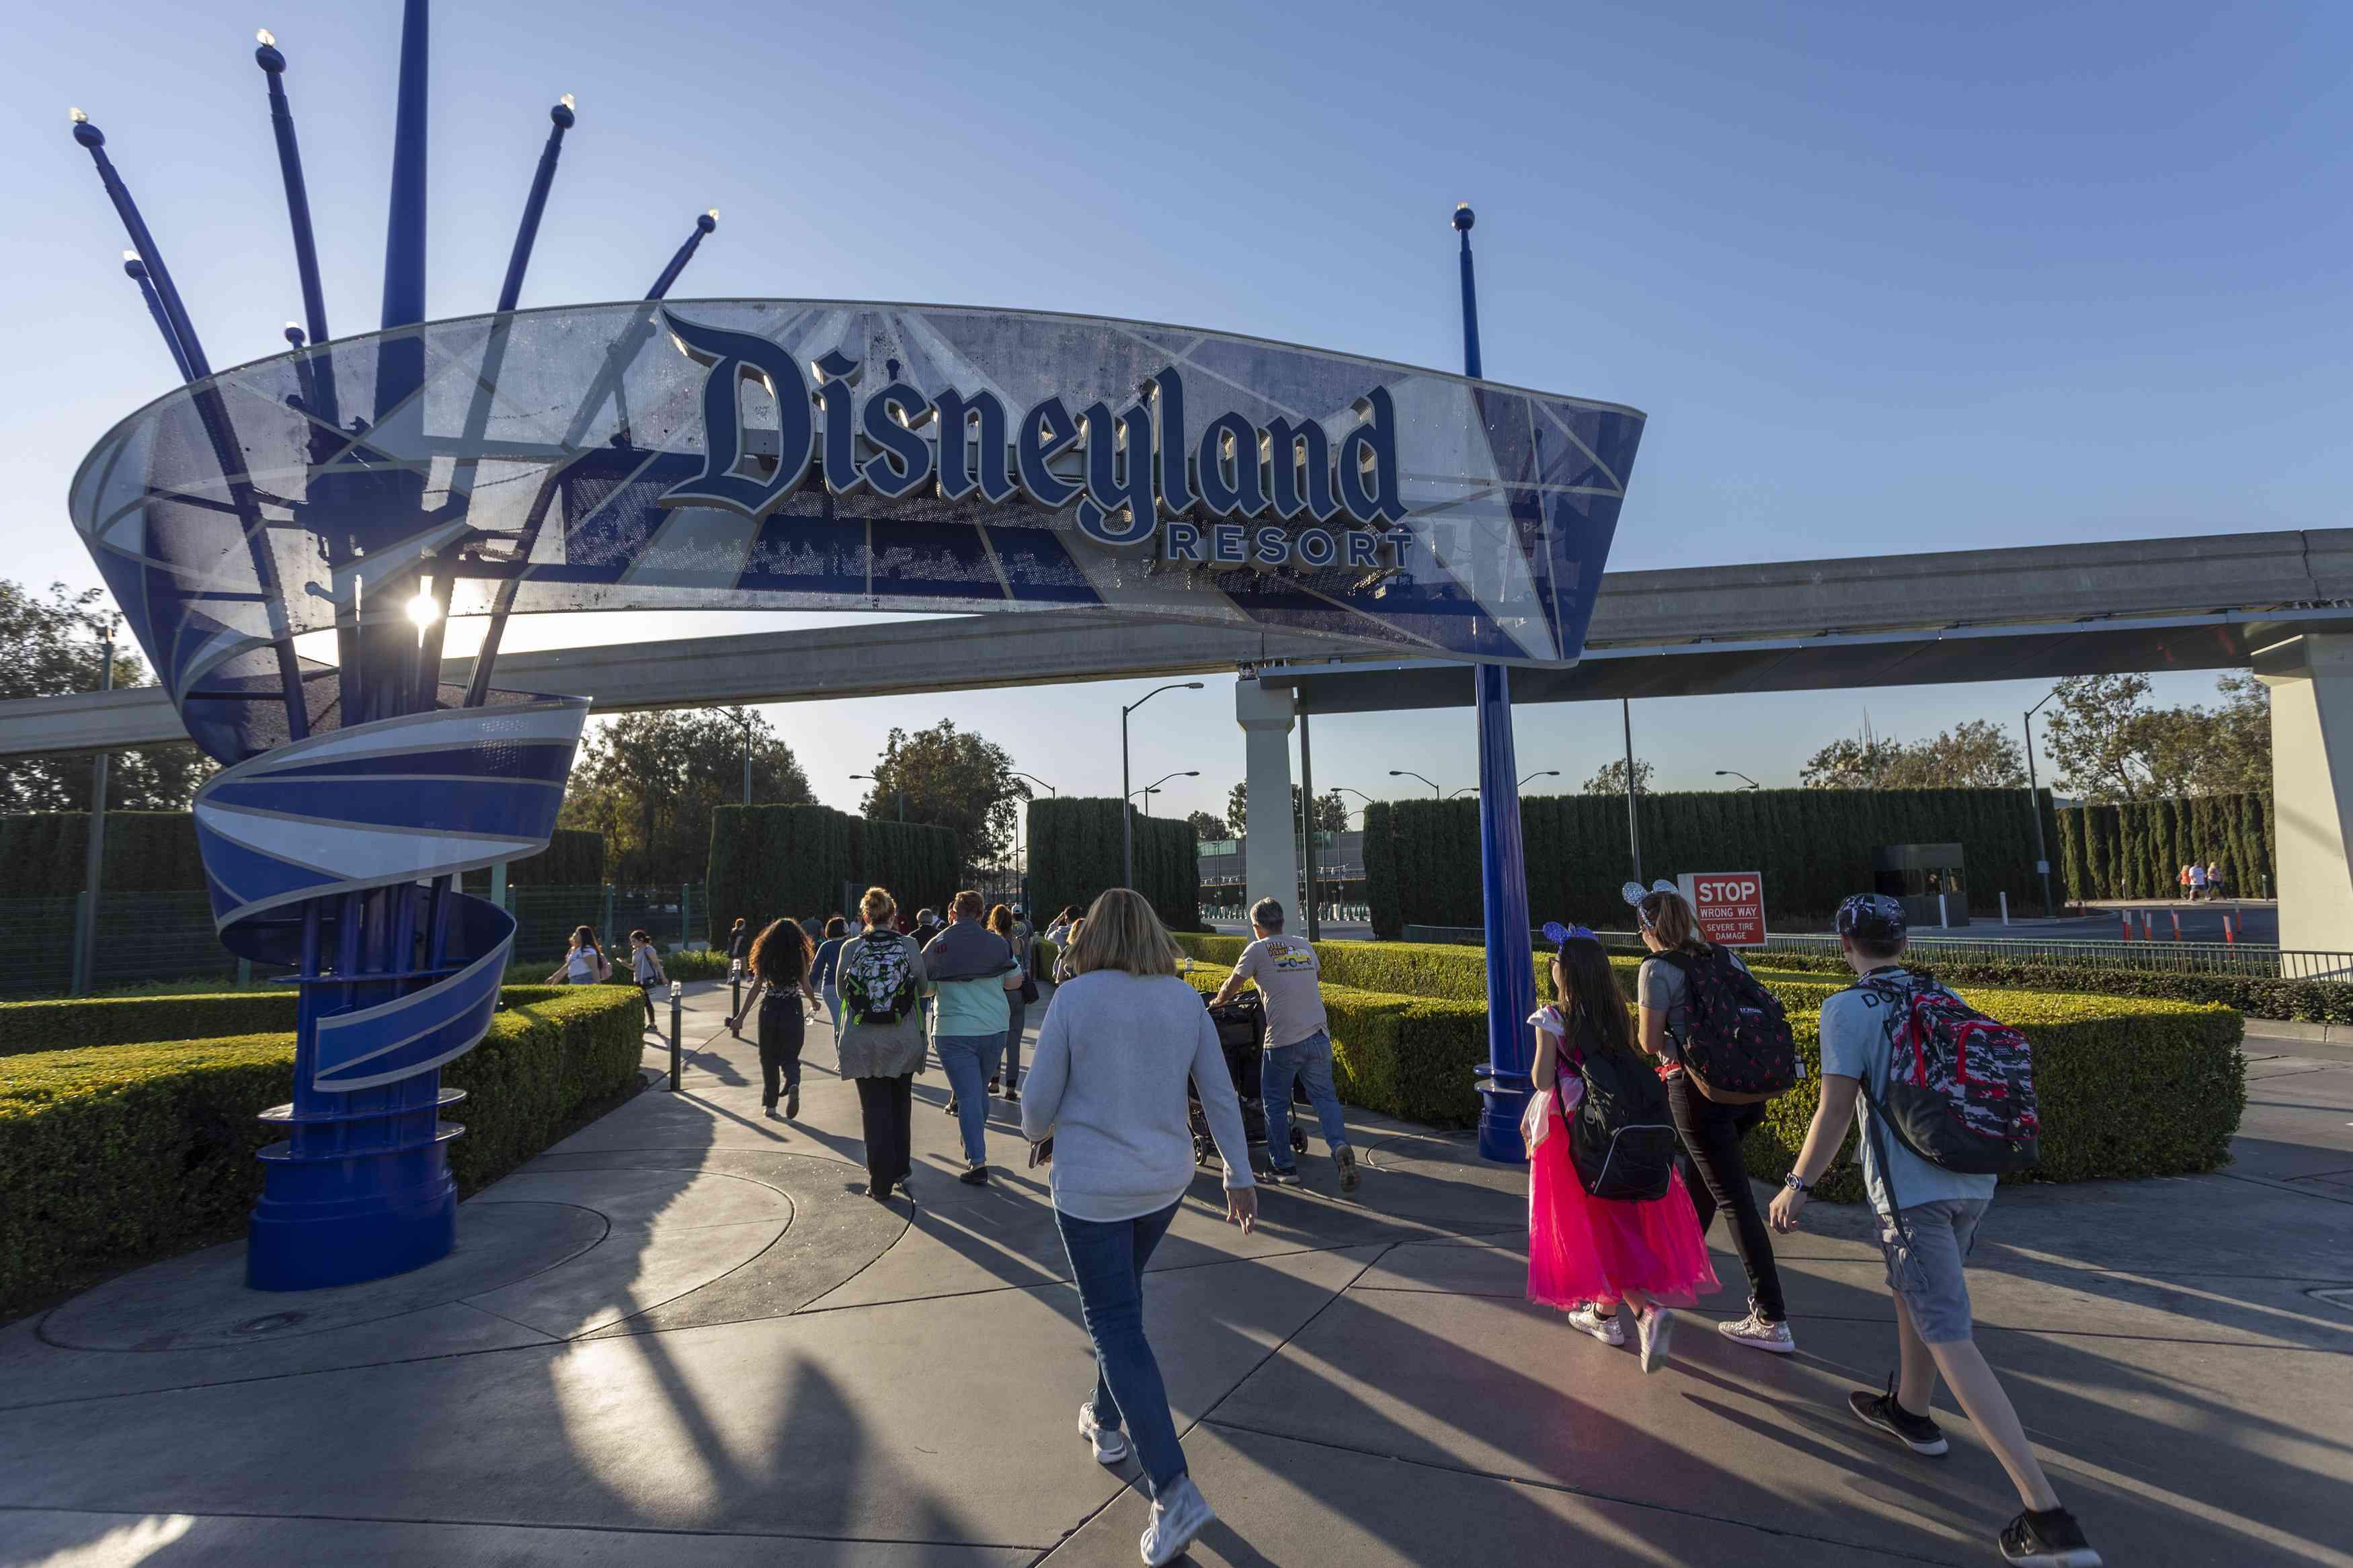 Disneyland entrance in Anaheim, California